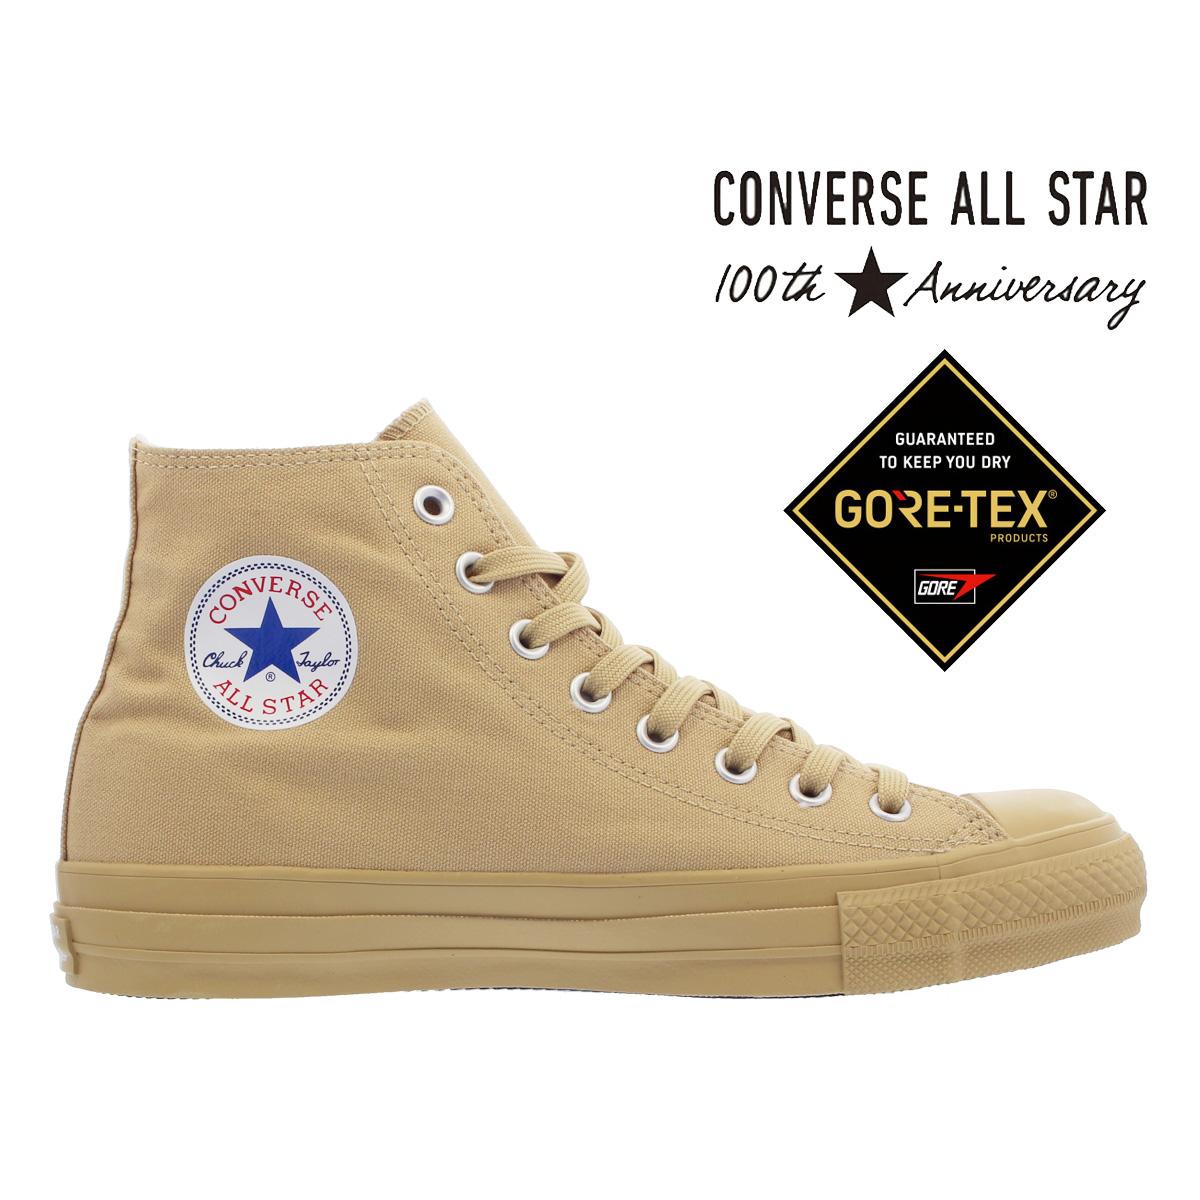 CONVERSE ALL STAR 100 GORE-TEX MN HI 【100周年】 【100th ANNIVERSARY】 コンバース オールスター 100 ゴア テックス MN HI BEIGE 32069979